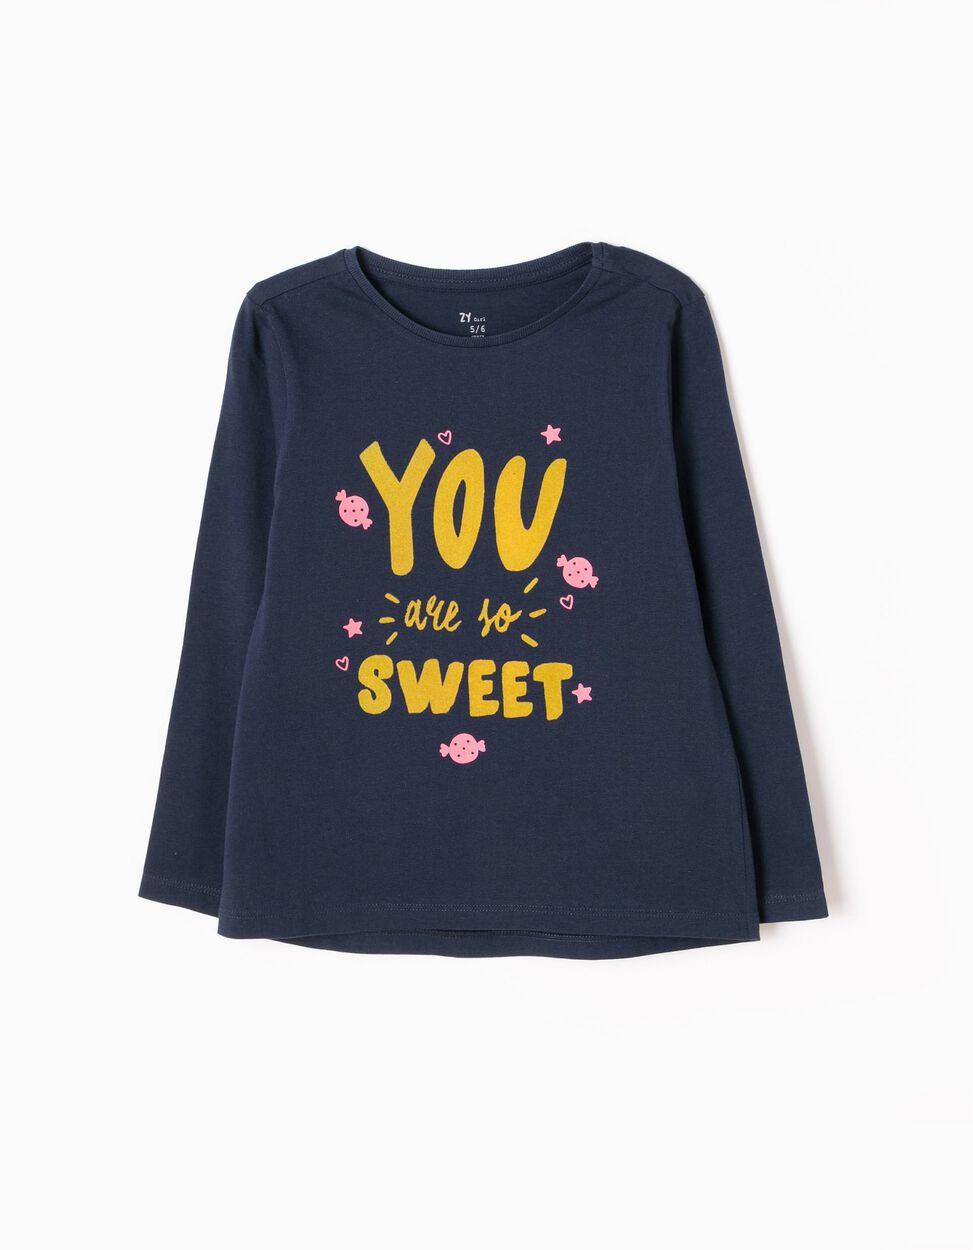 T-shirt Manga Comprida Sweet Azul